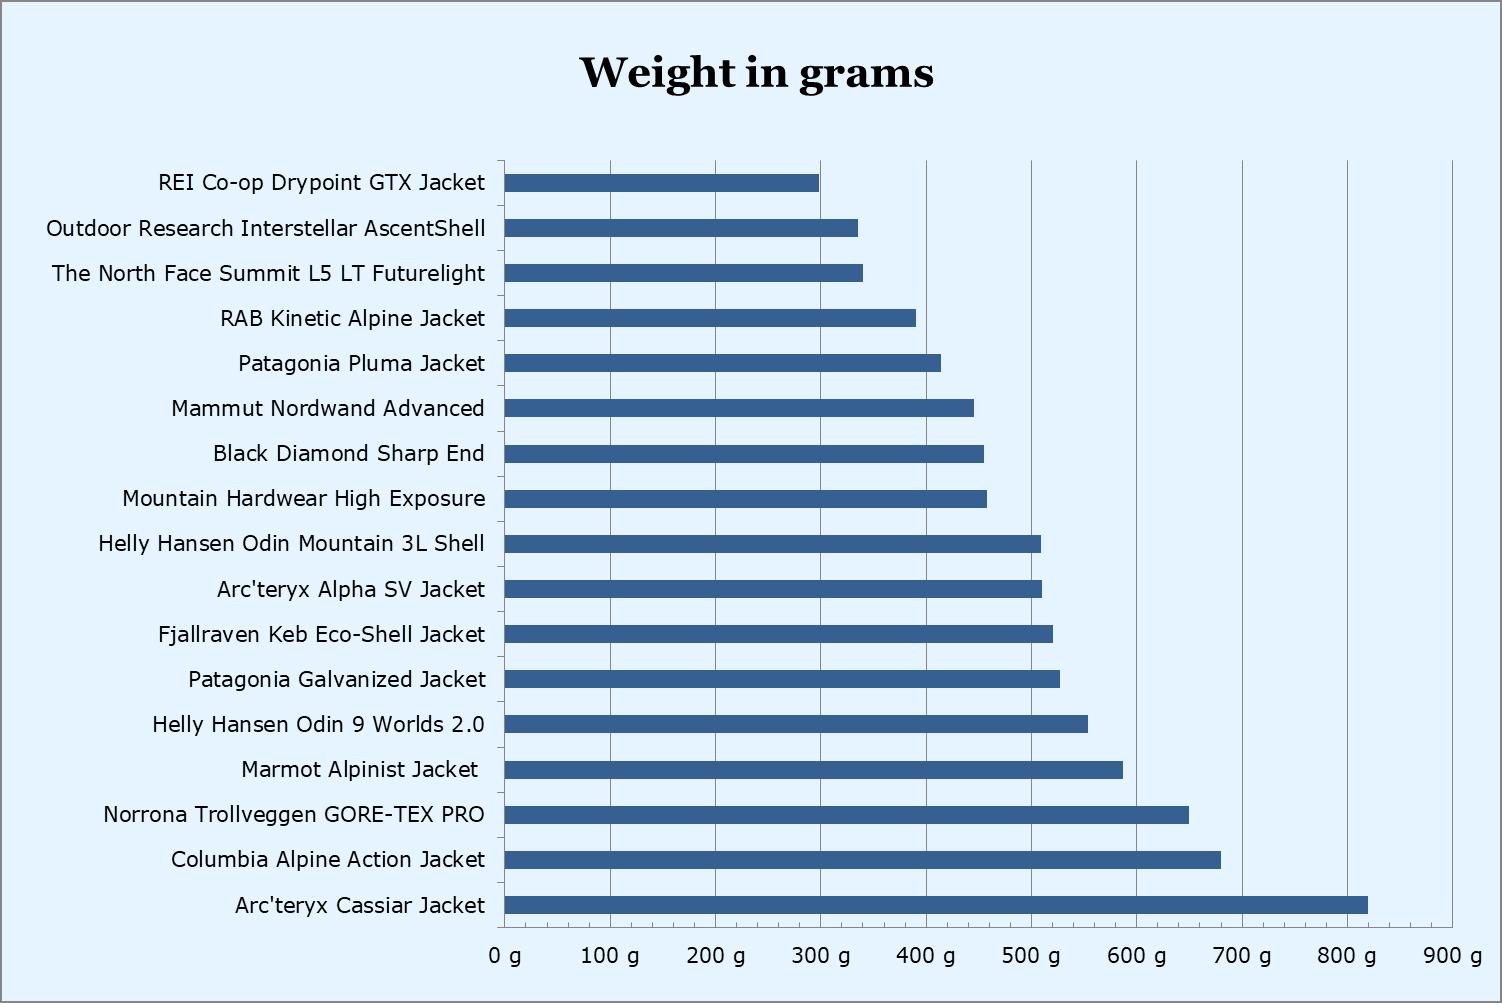 Hardshell jackets weight comparison